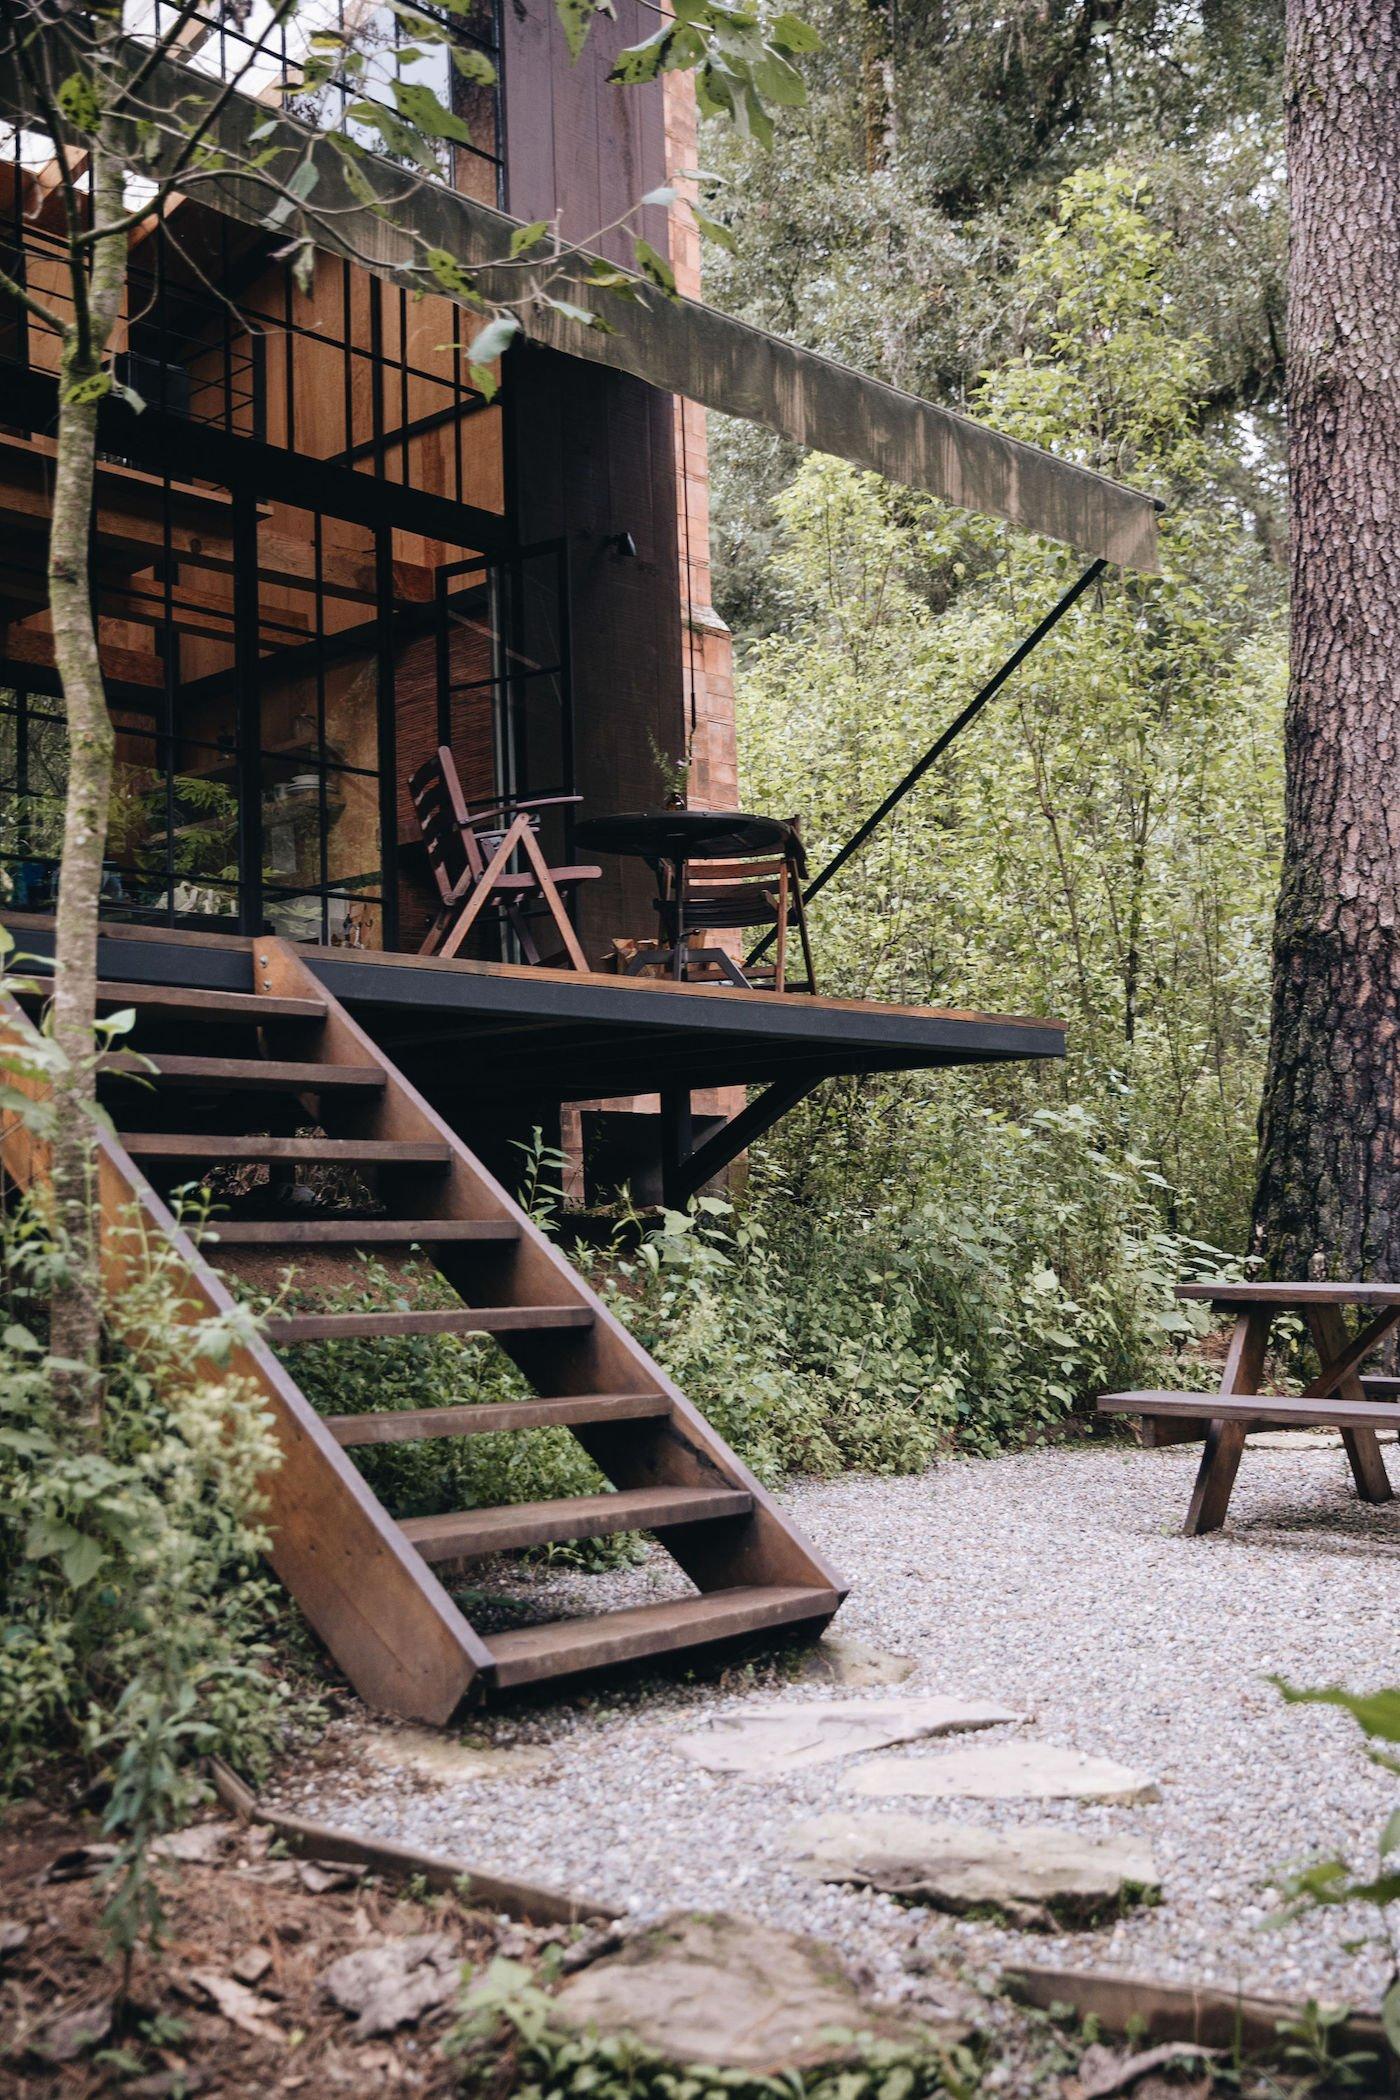 Wooden steps up to wooden verandah